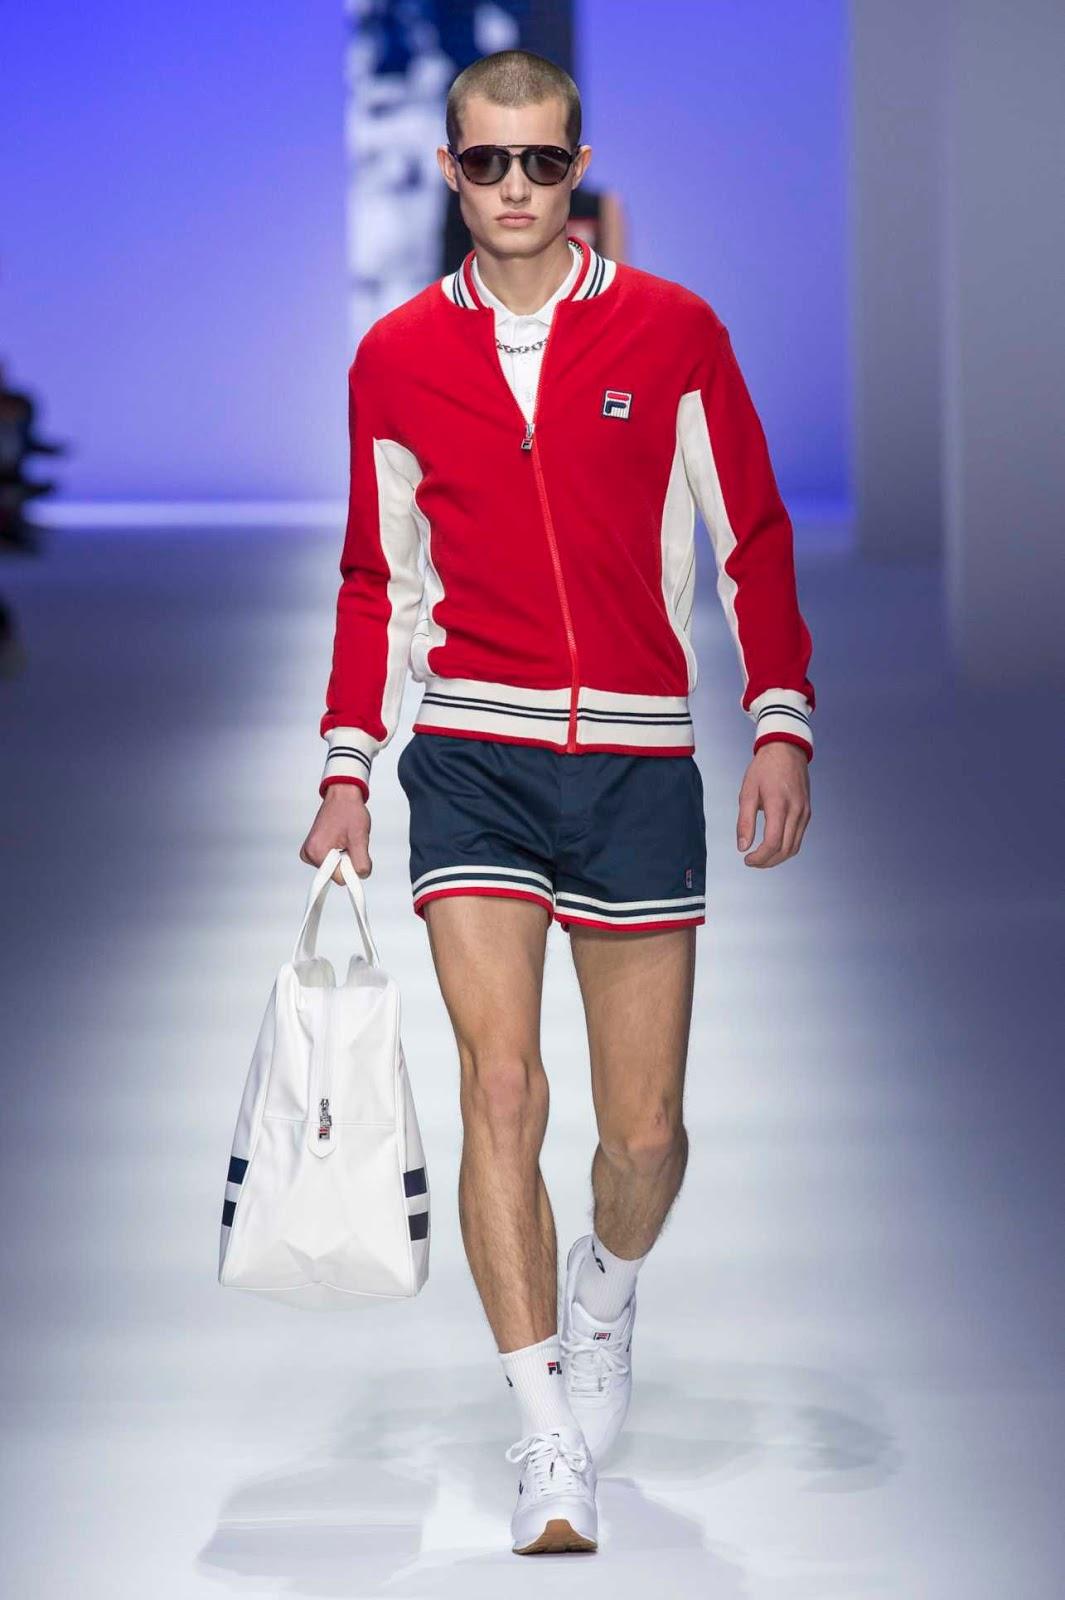 fila springsummer 2019 runway show male fashion trends